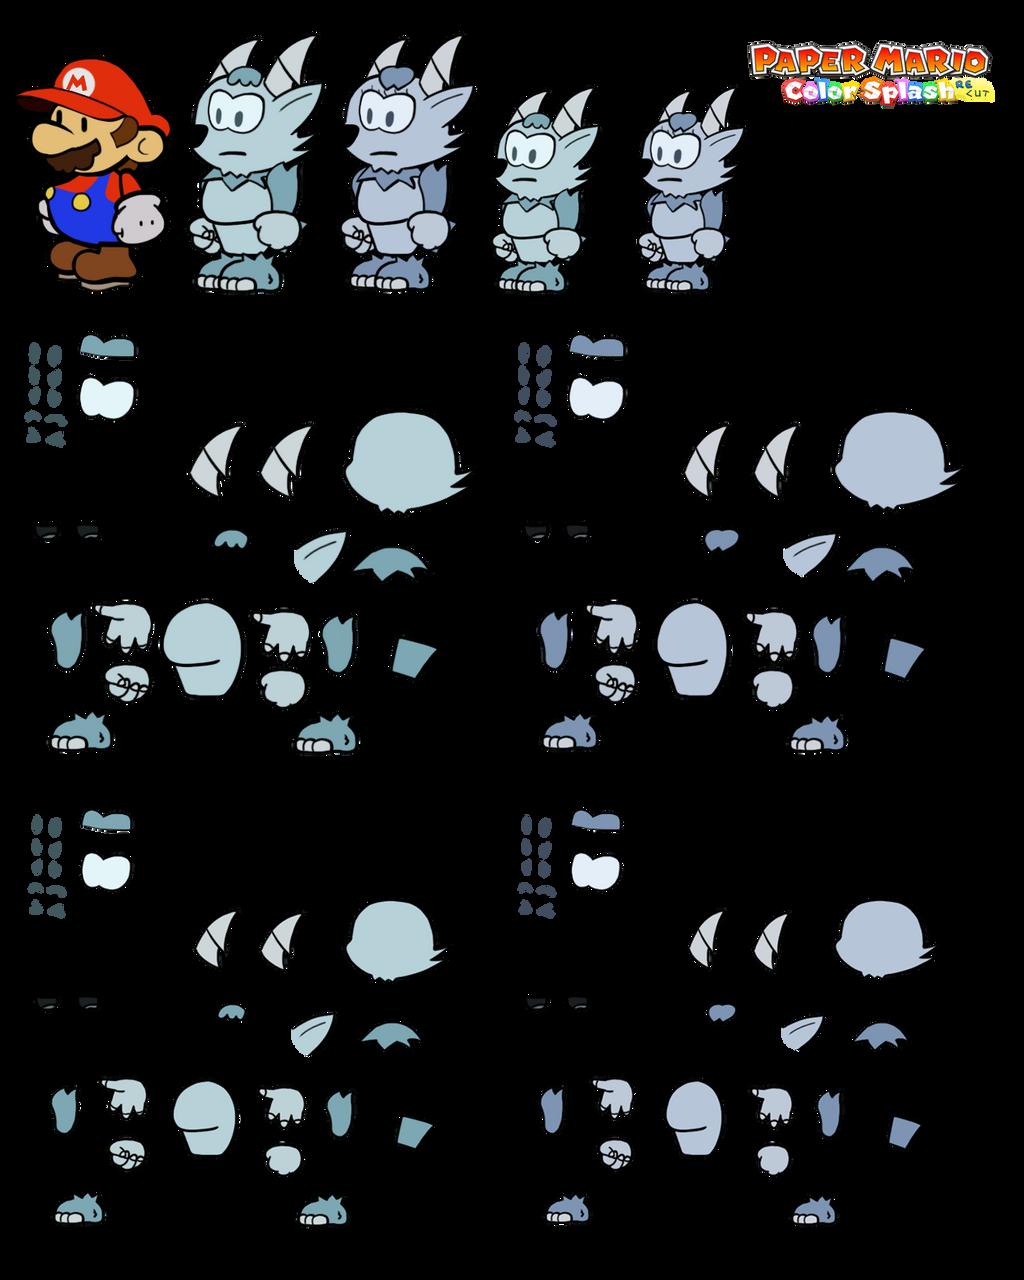 Vellbex v2 (Paper Mario Color Splash Recut) by DerekminyA